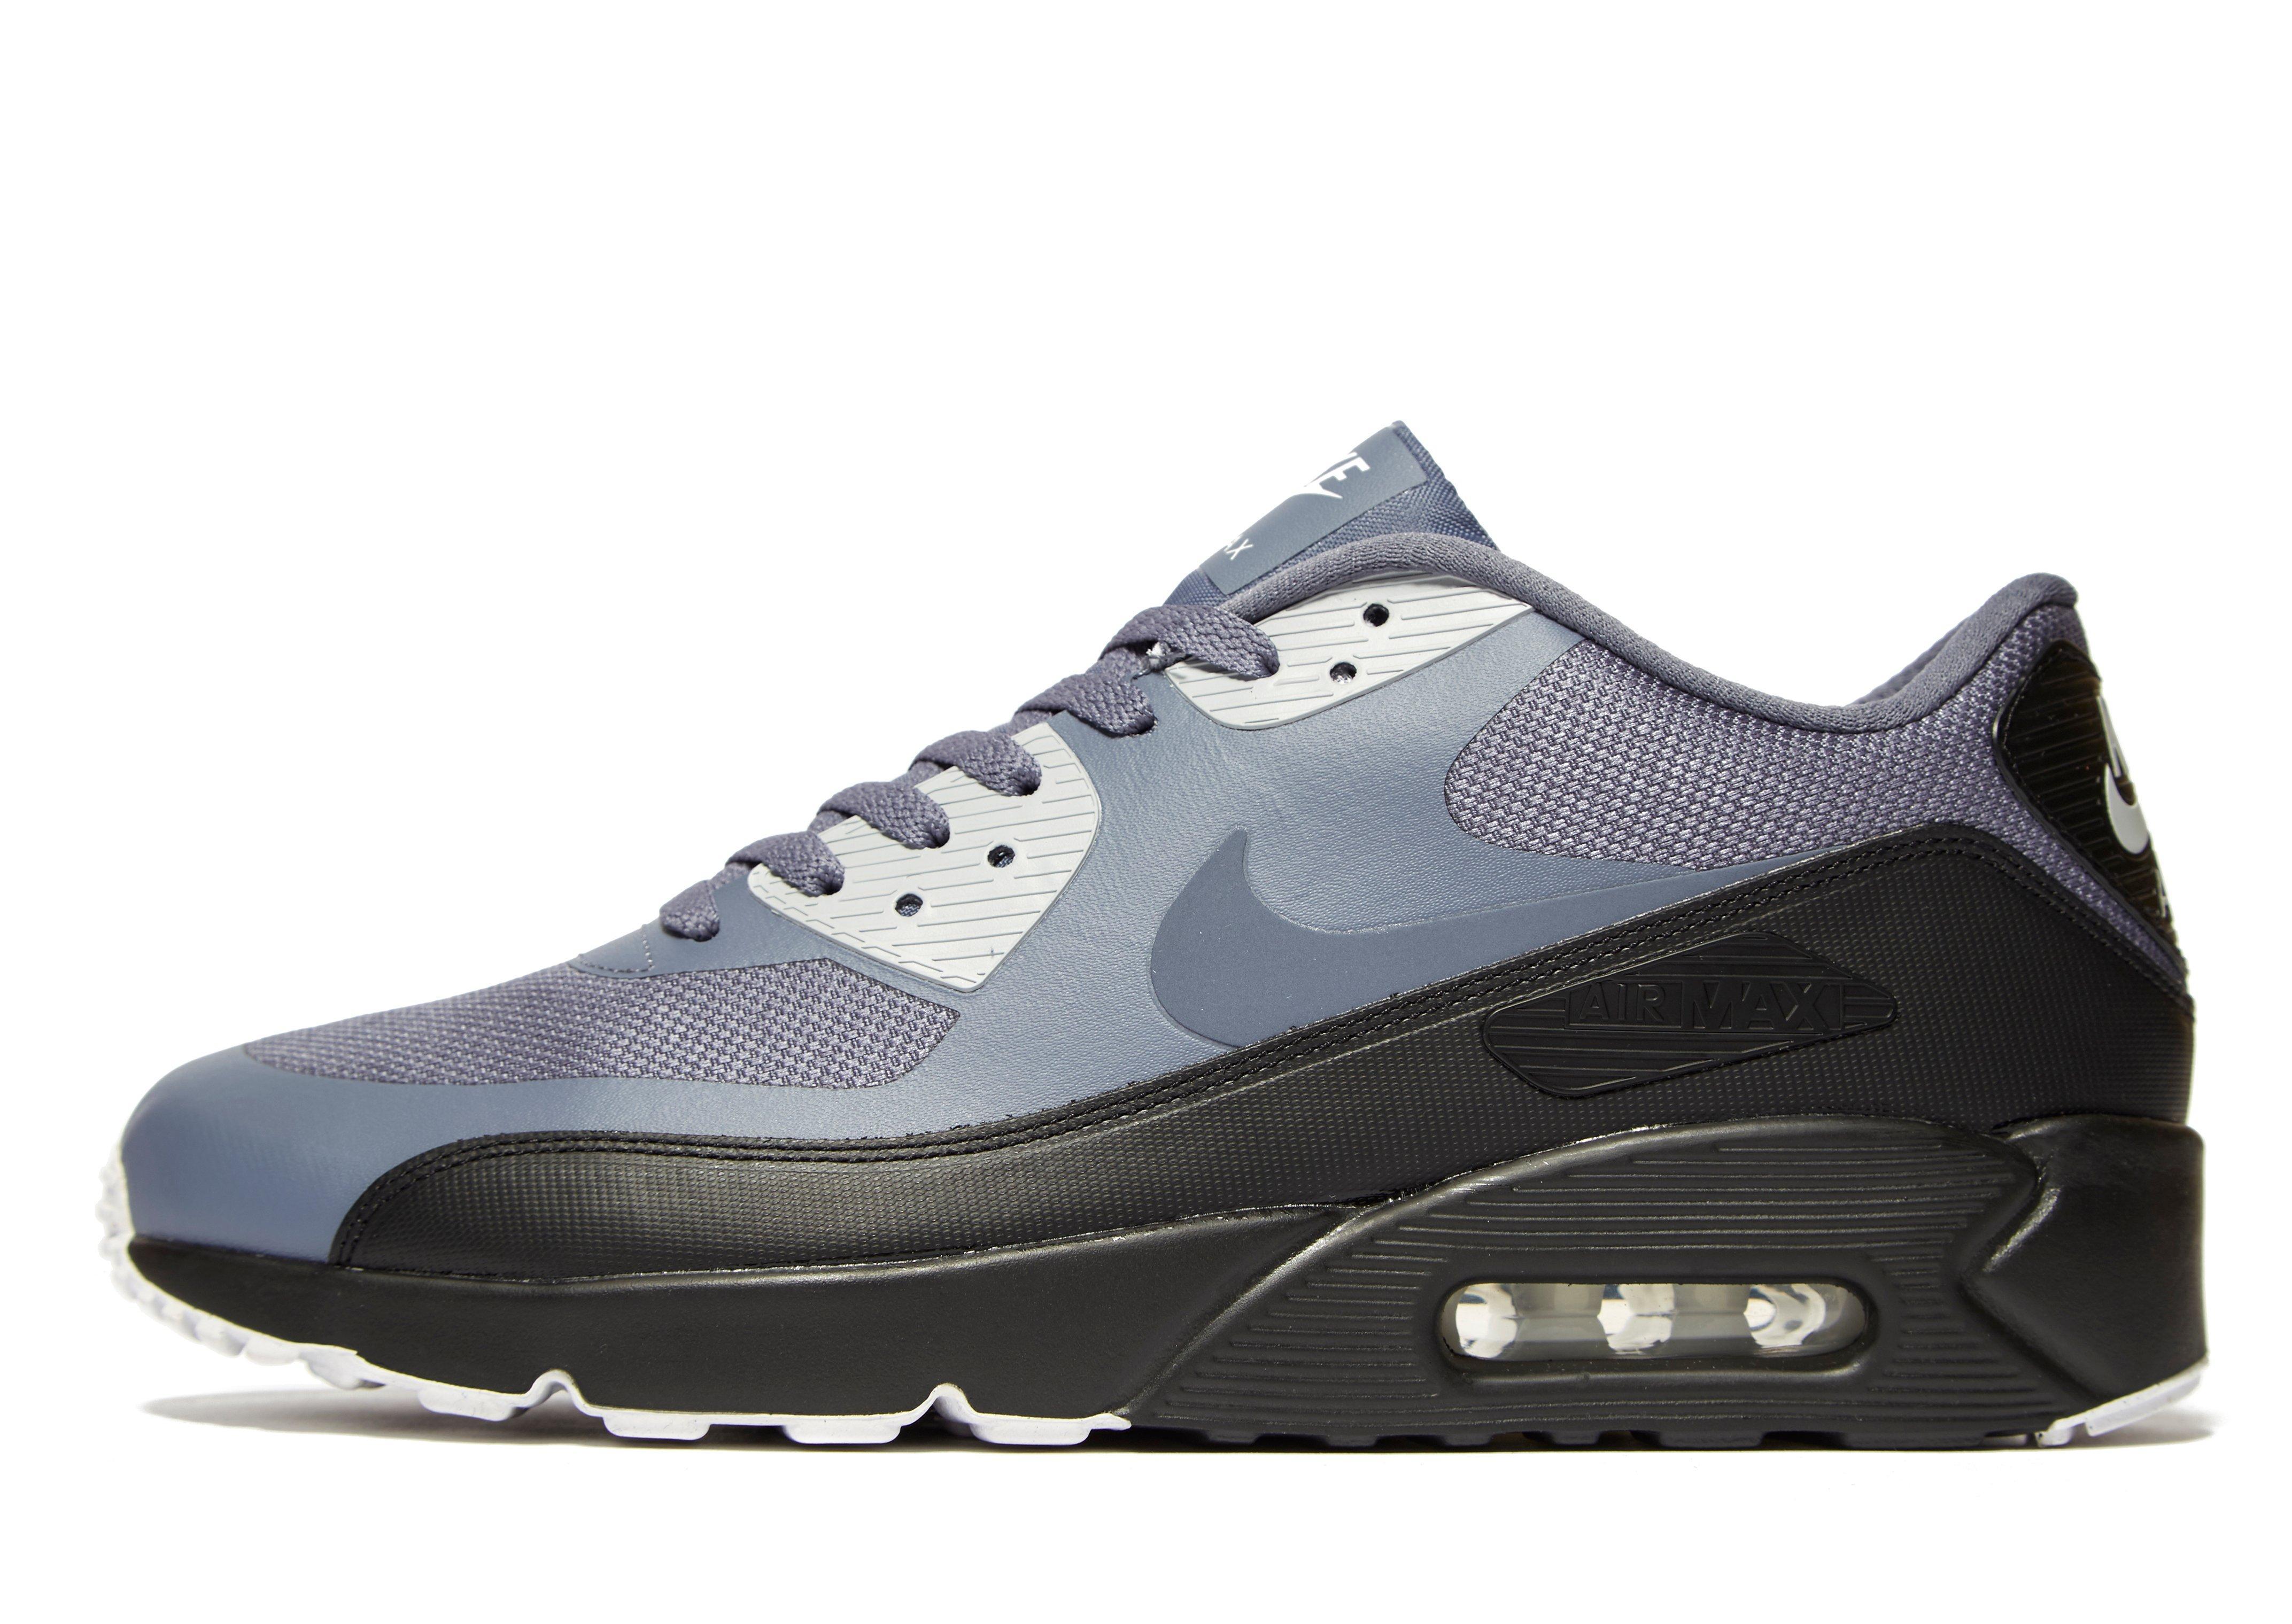 separation shoes 1d5e1 7e030 nike air max 90 ultra